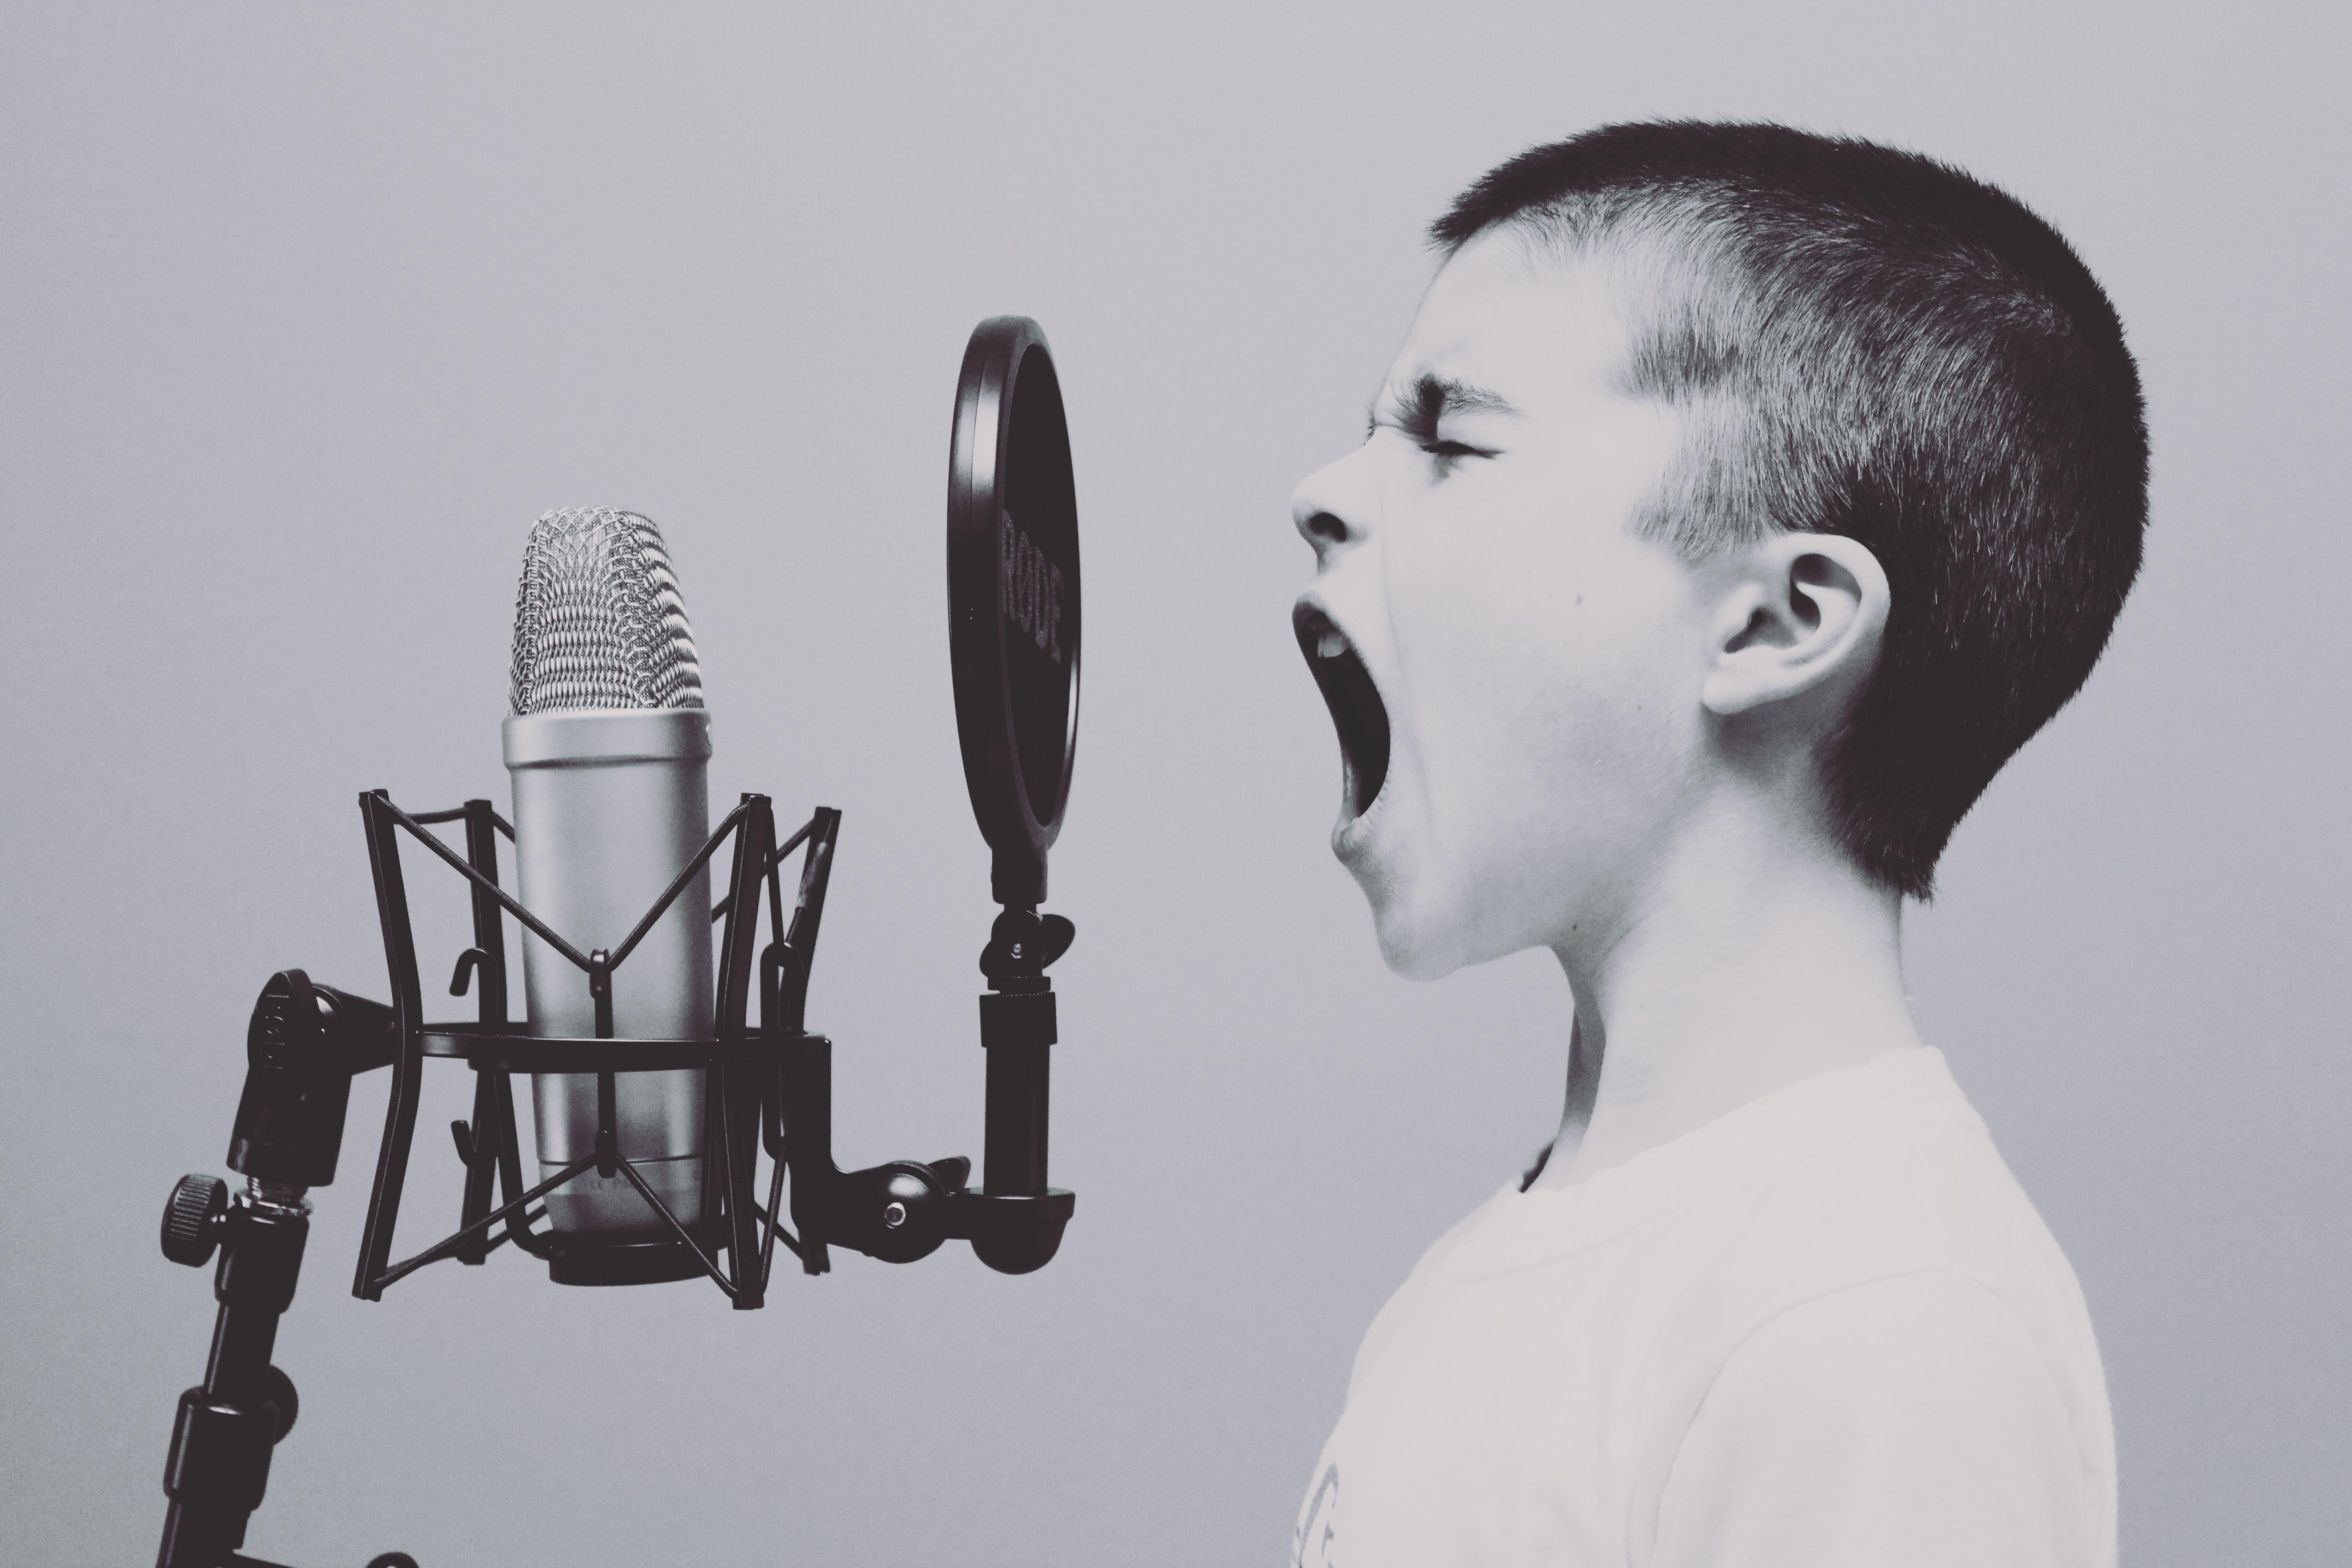 stockvault-singing184766